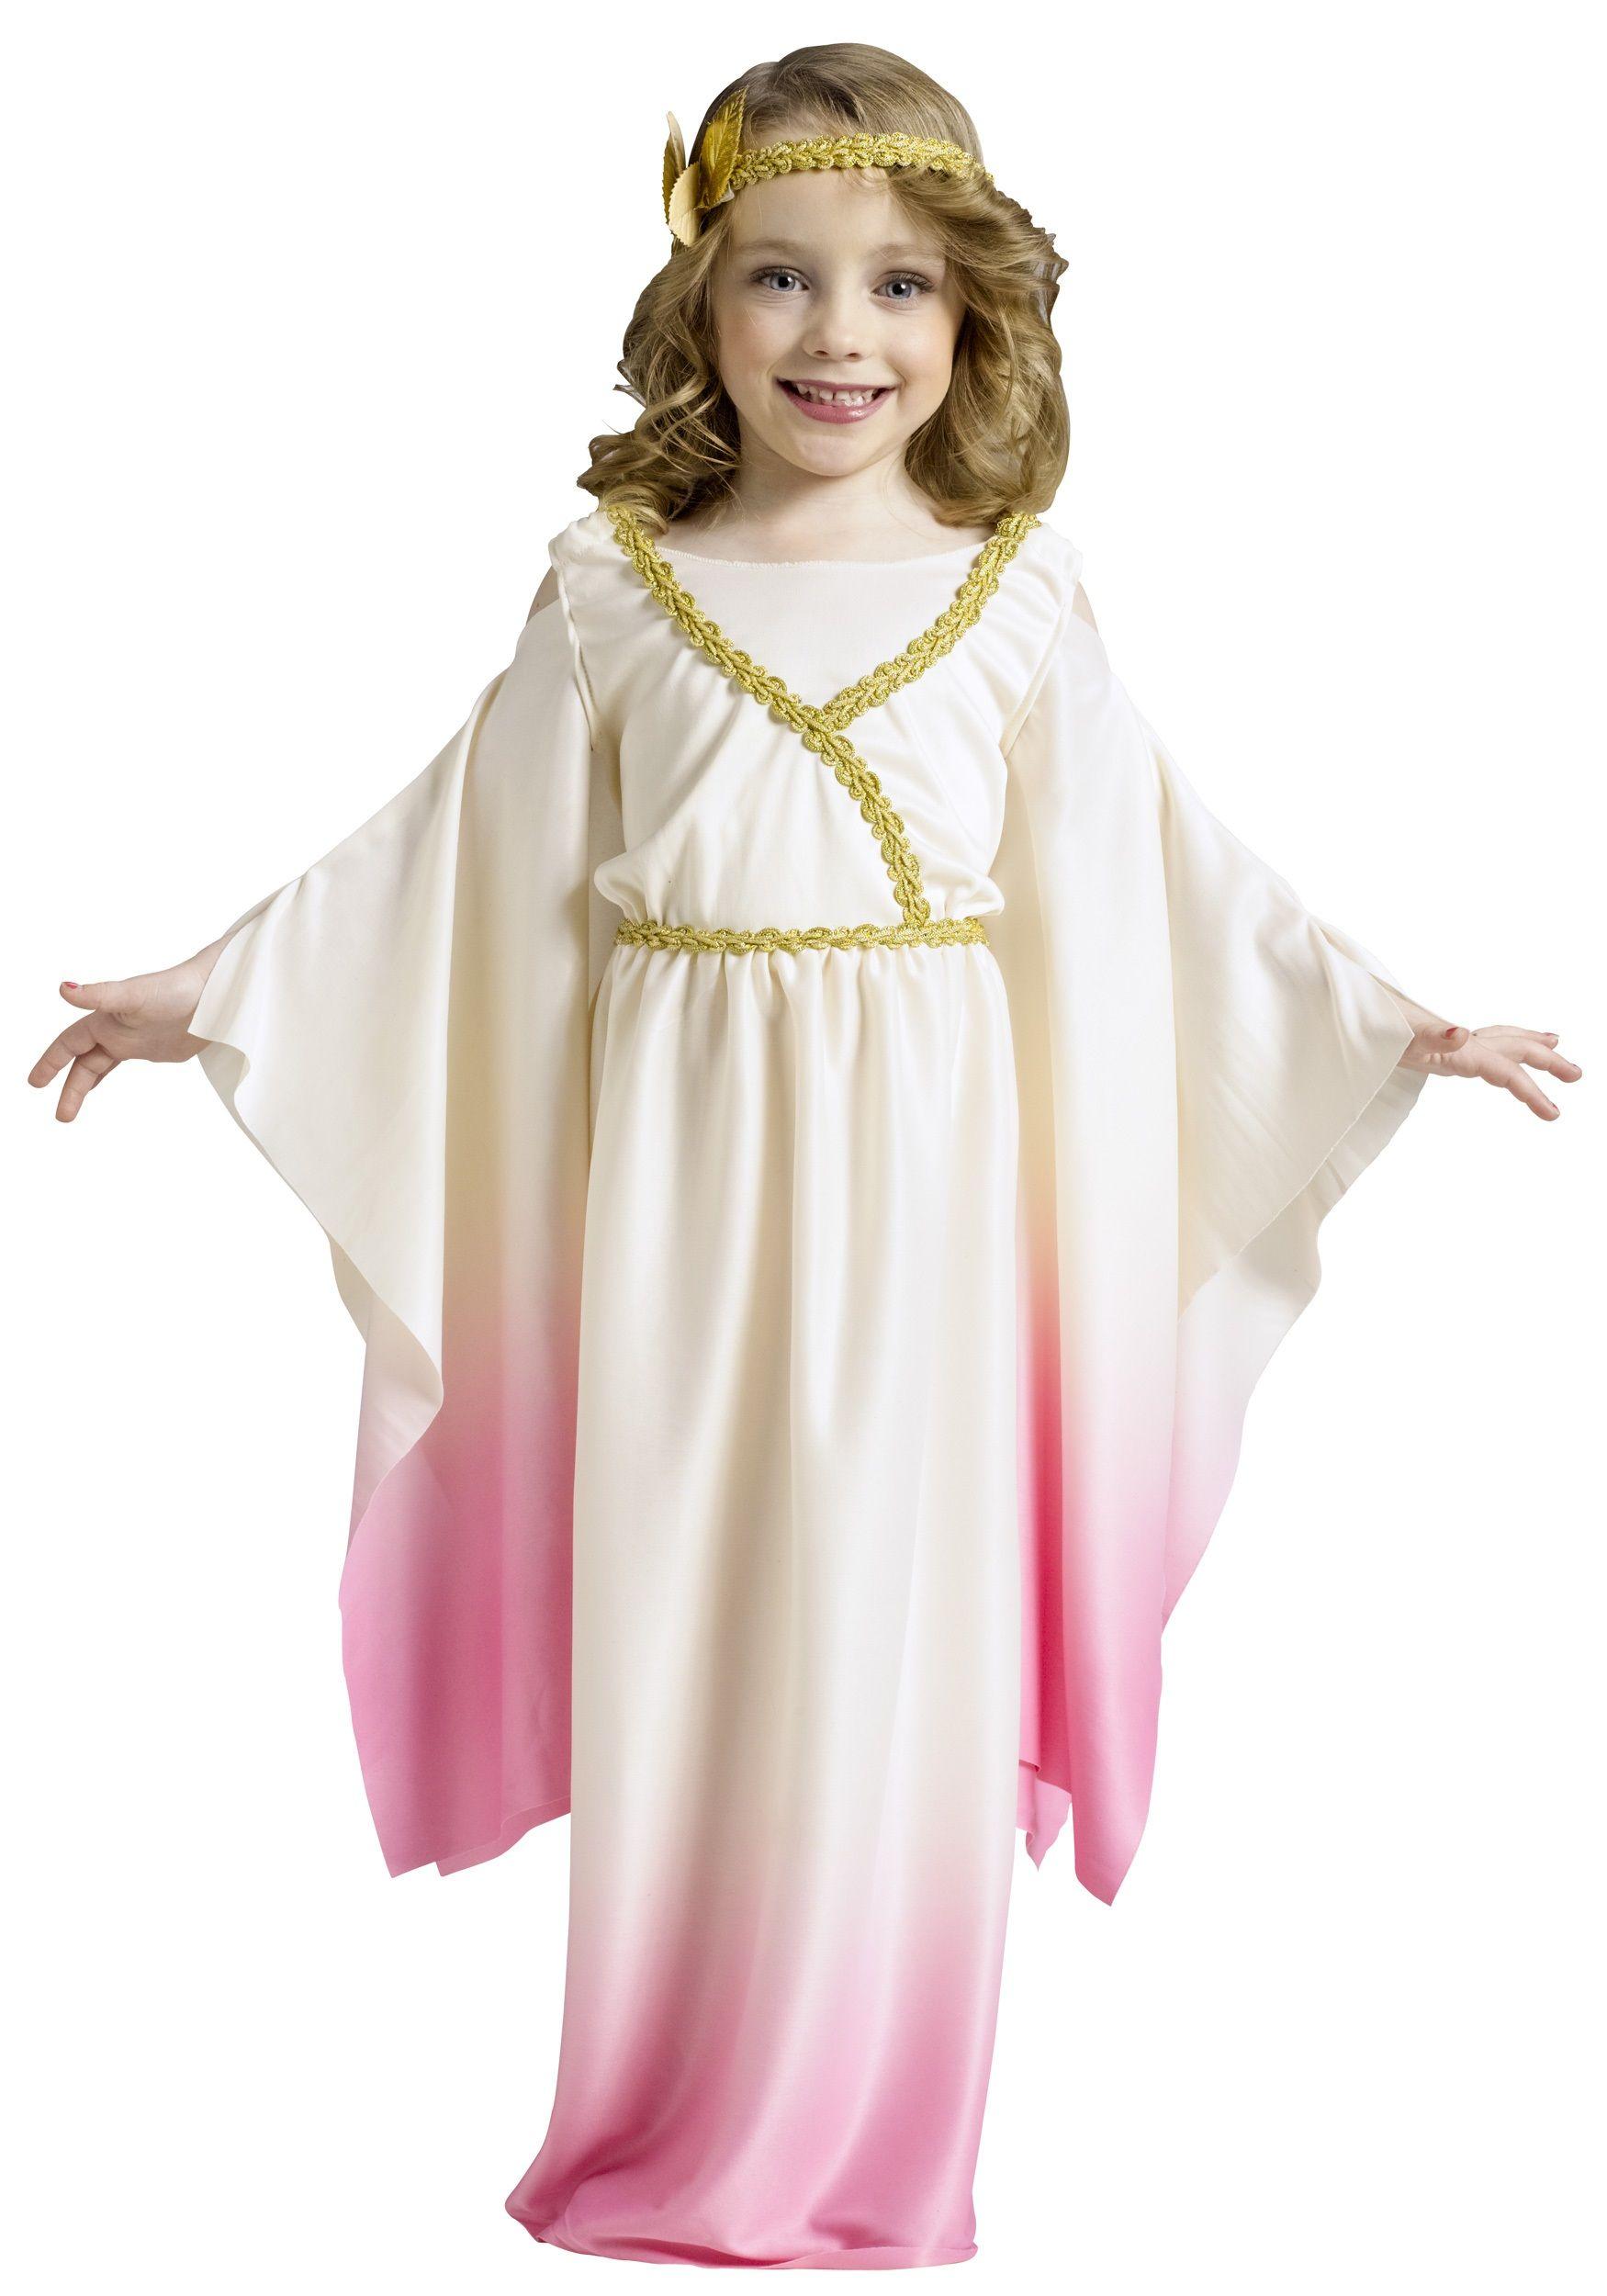 aphrodite childrens costume - Google Search | Goddess ...